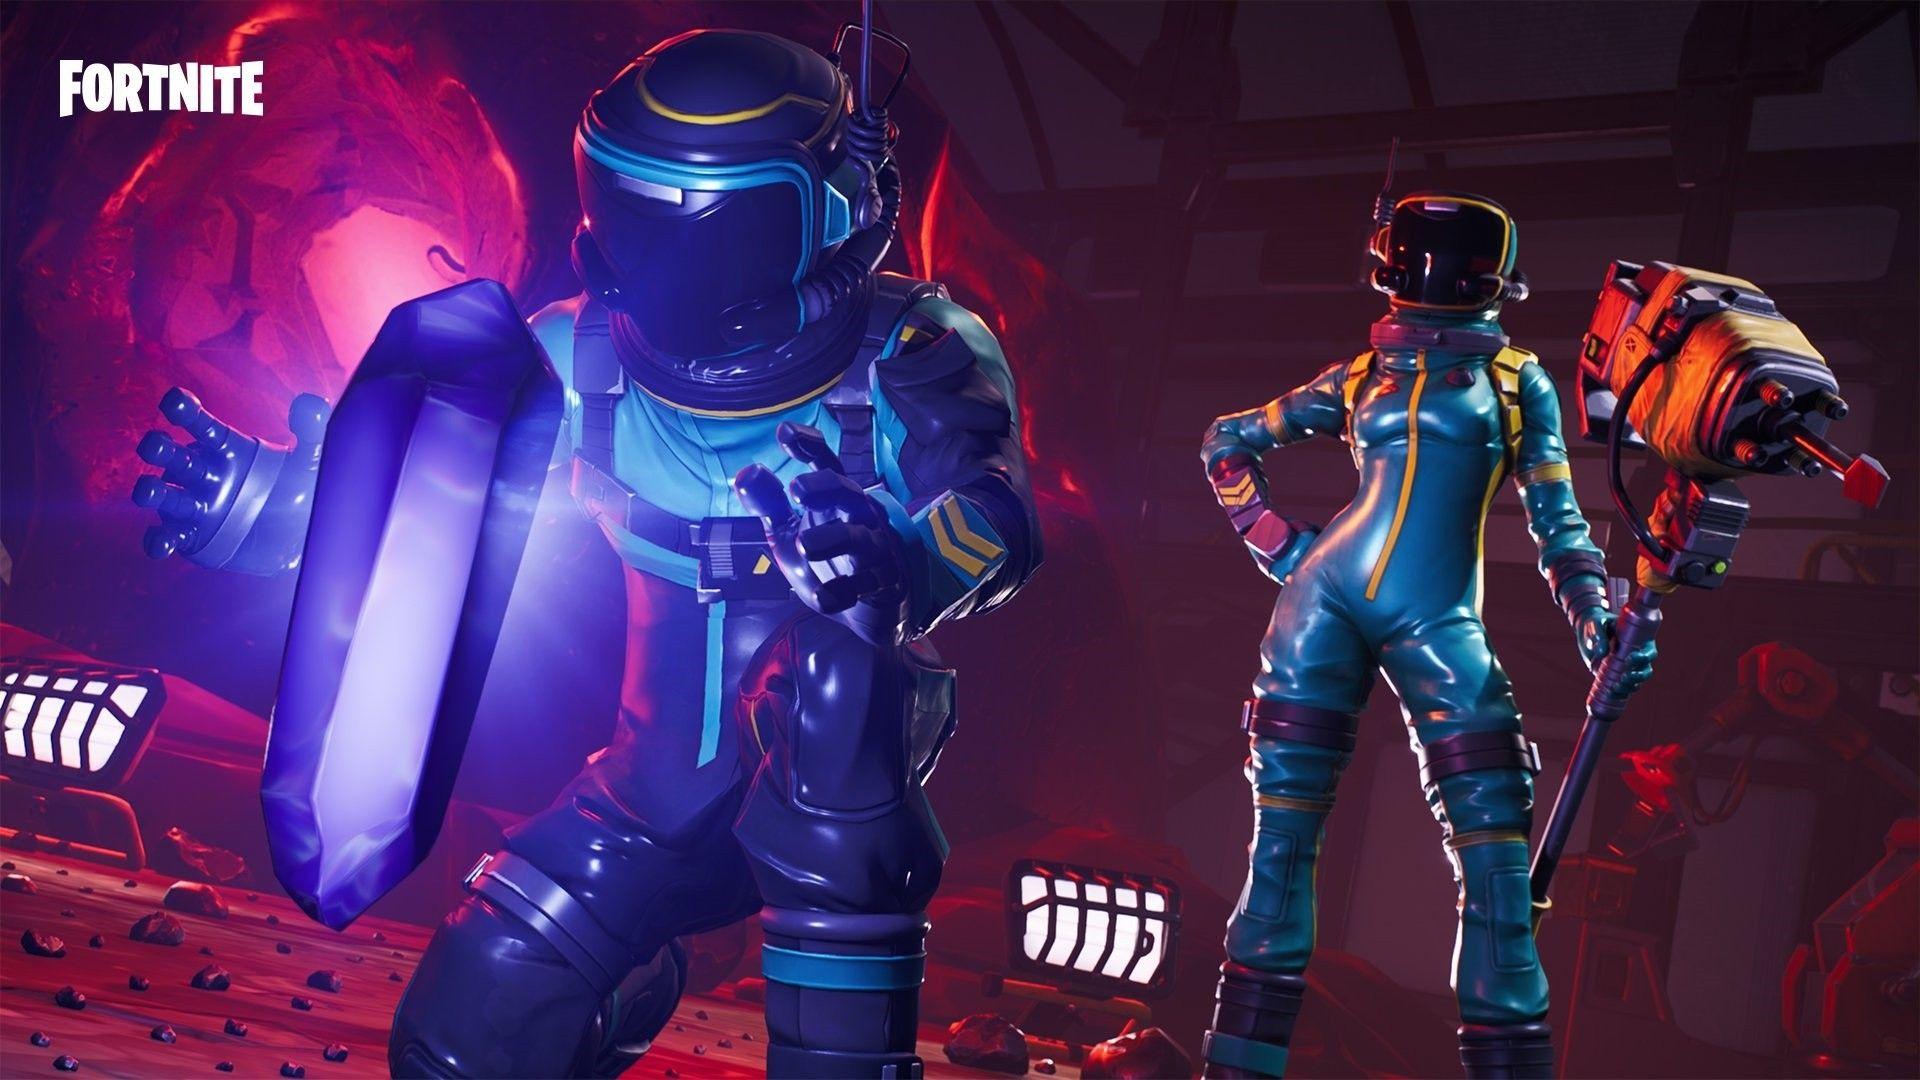 Week 9 Loading Screen Fortnite Royal Battle Epic Games In 2019